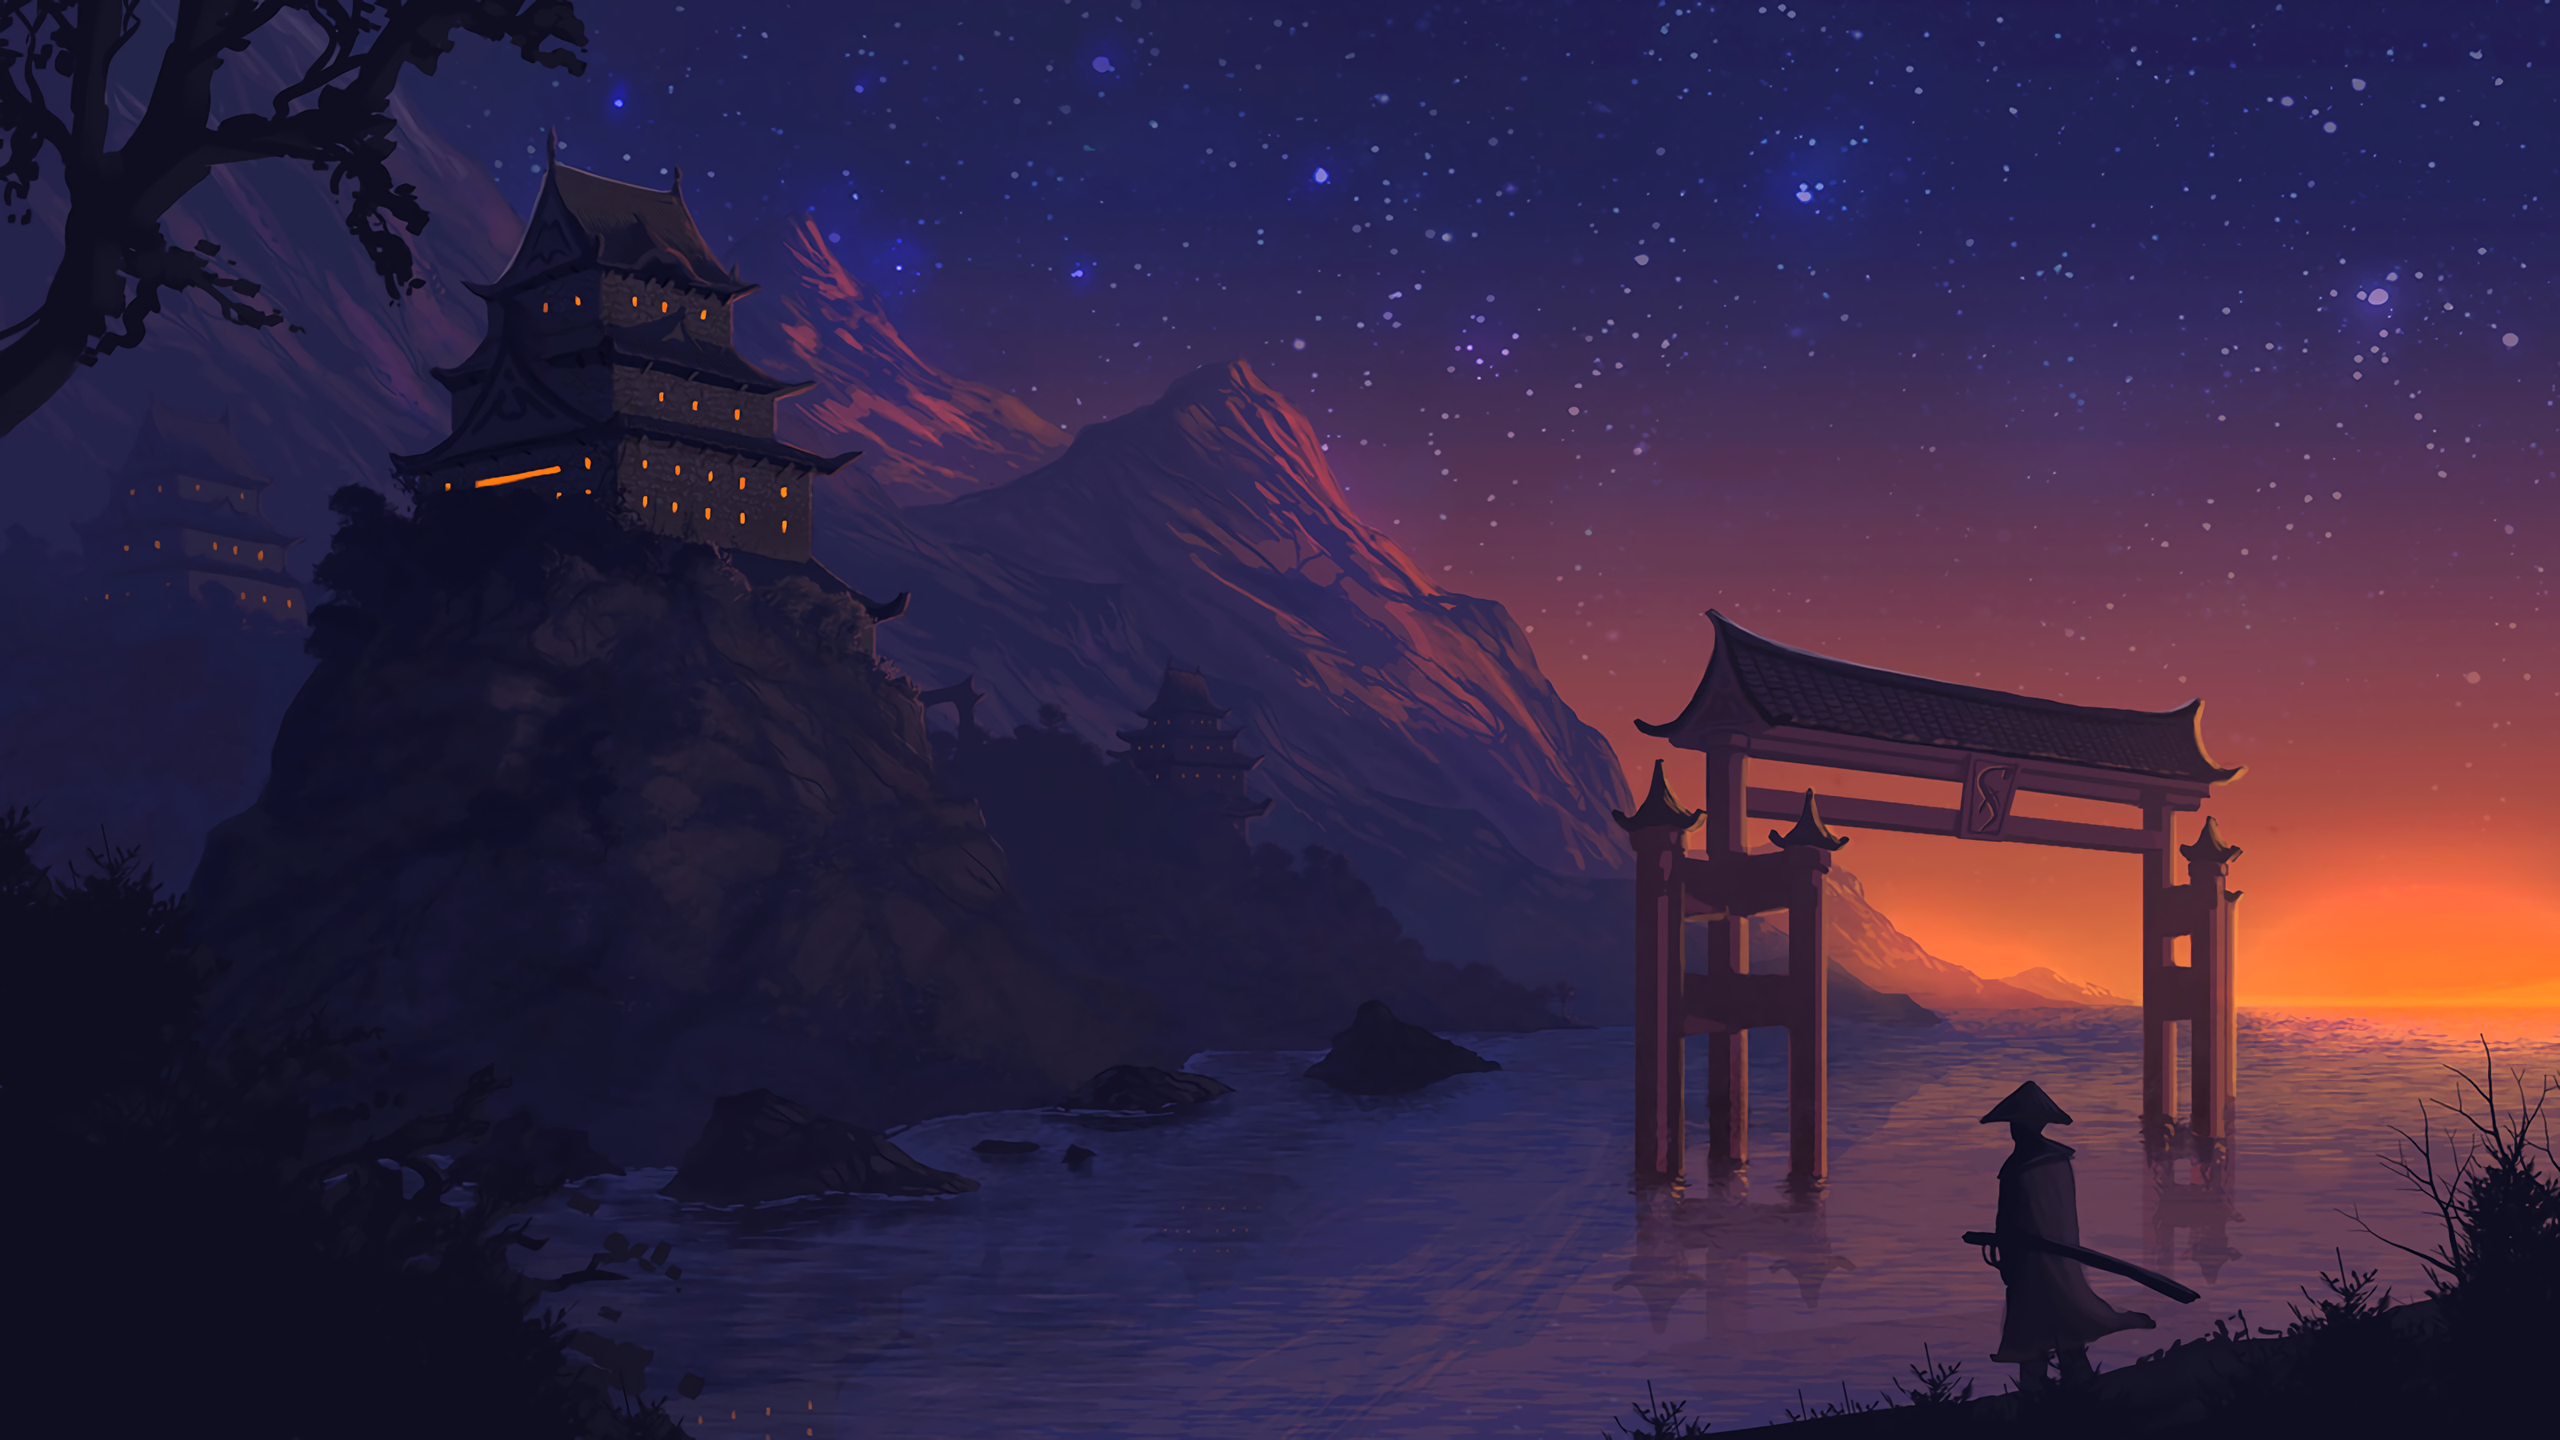 Night Anime Wallpaper 2560x1440 Download Hd Wallpaper Wallpapertip